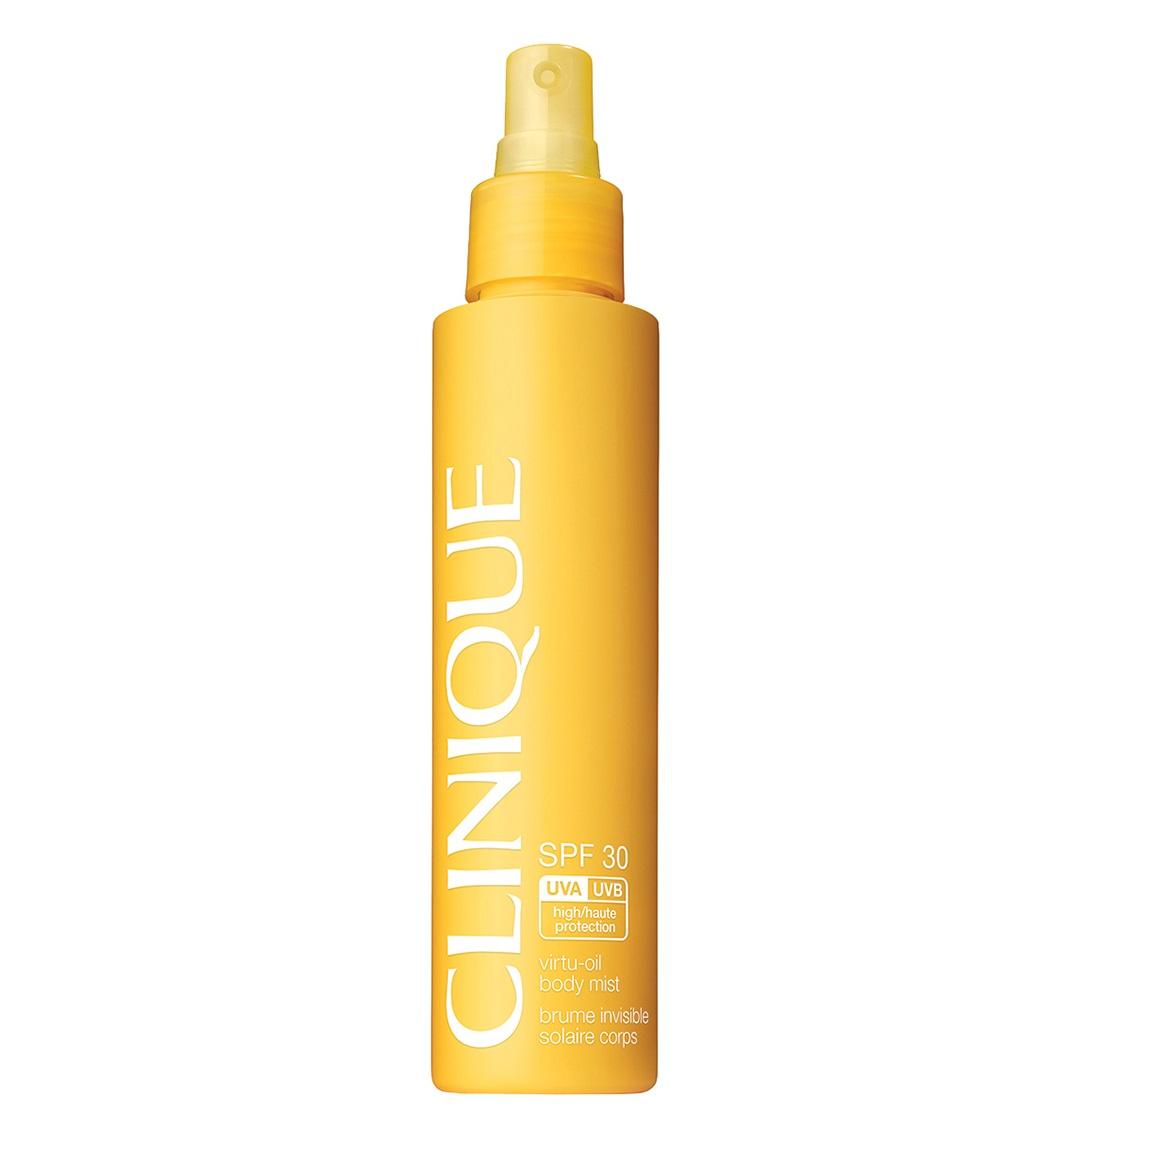 Clinique Sun - Virtu Oil Body Mist SPF30 144 ml